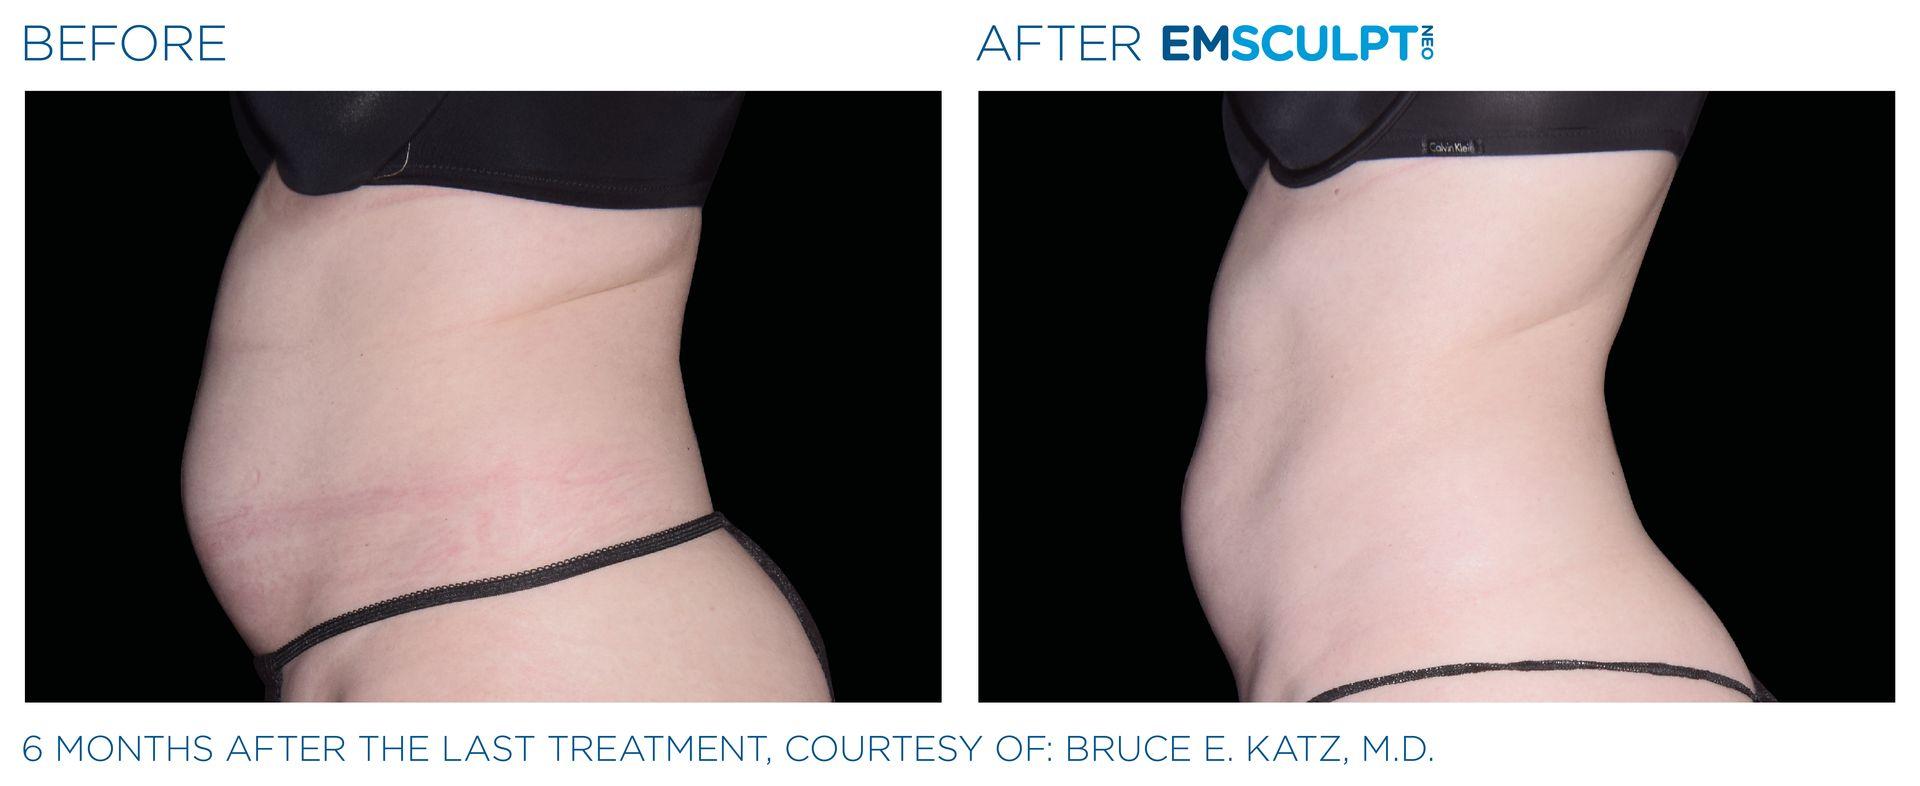 Emsculpt_neo_PIC_Ba-card-female-abdomen-038